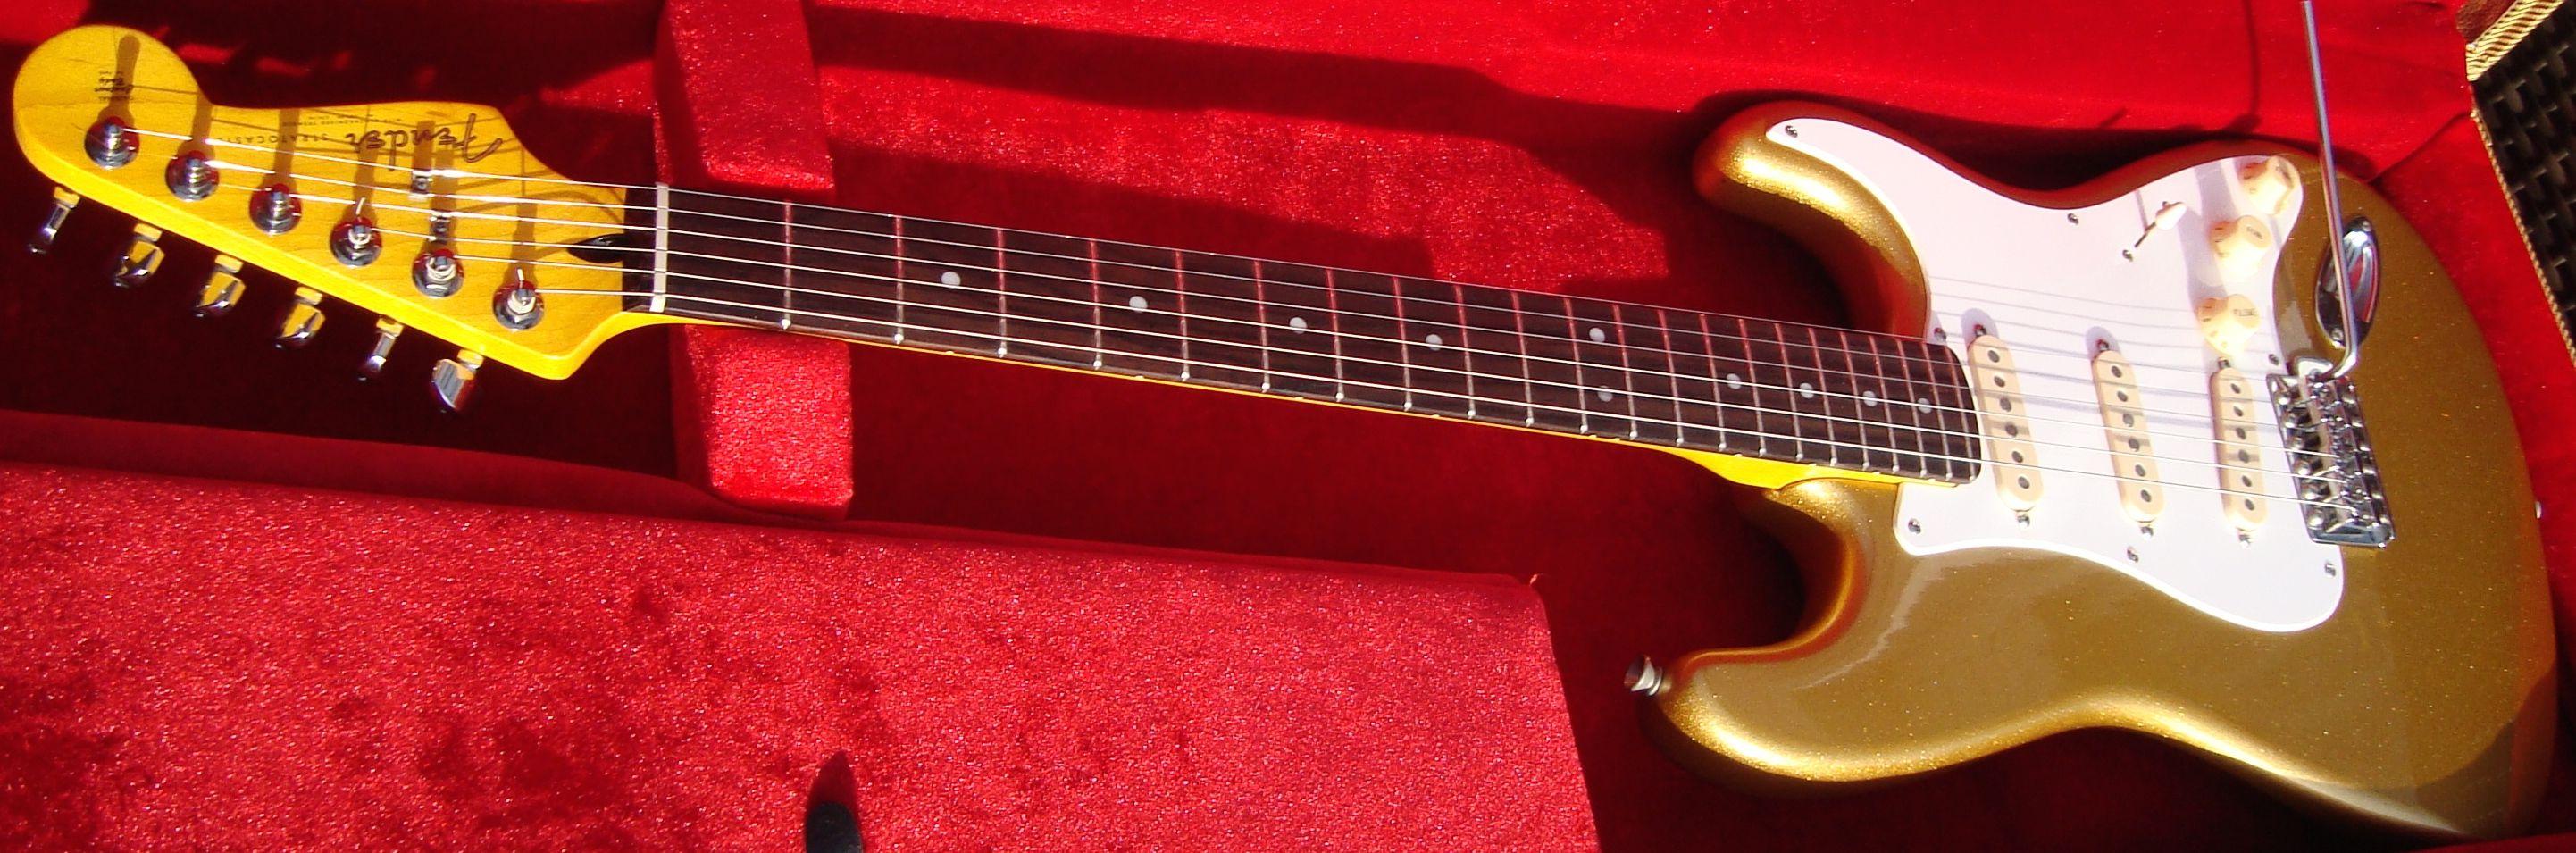 Fender stratocaster usa gold neuve 2016 micros for American classic usa